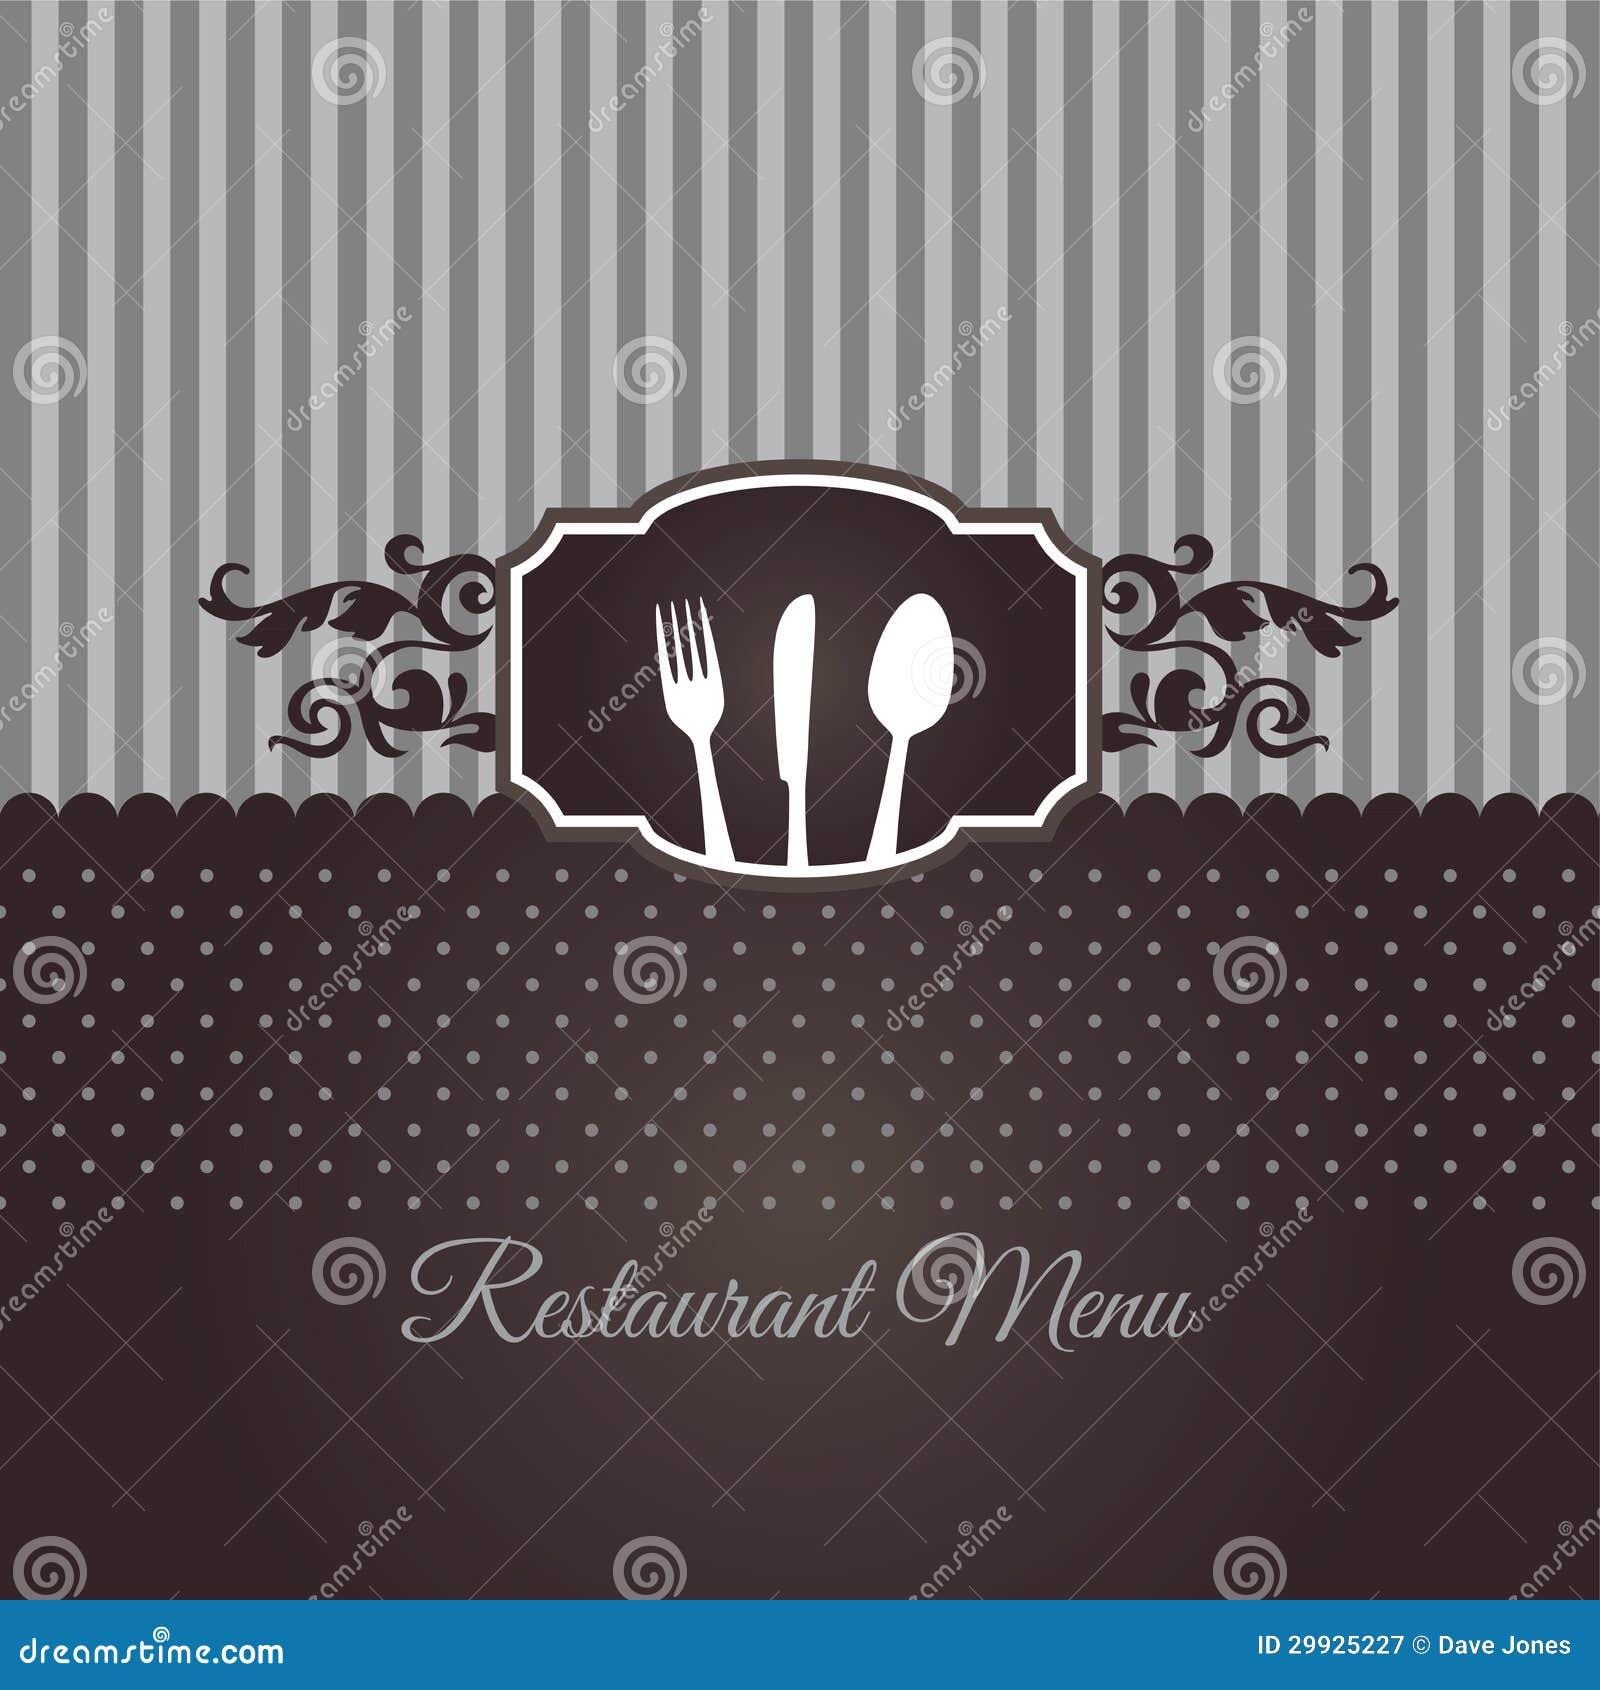 restaurant menu cover in chocolate brown stock vector